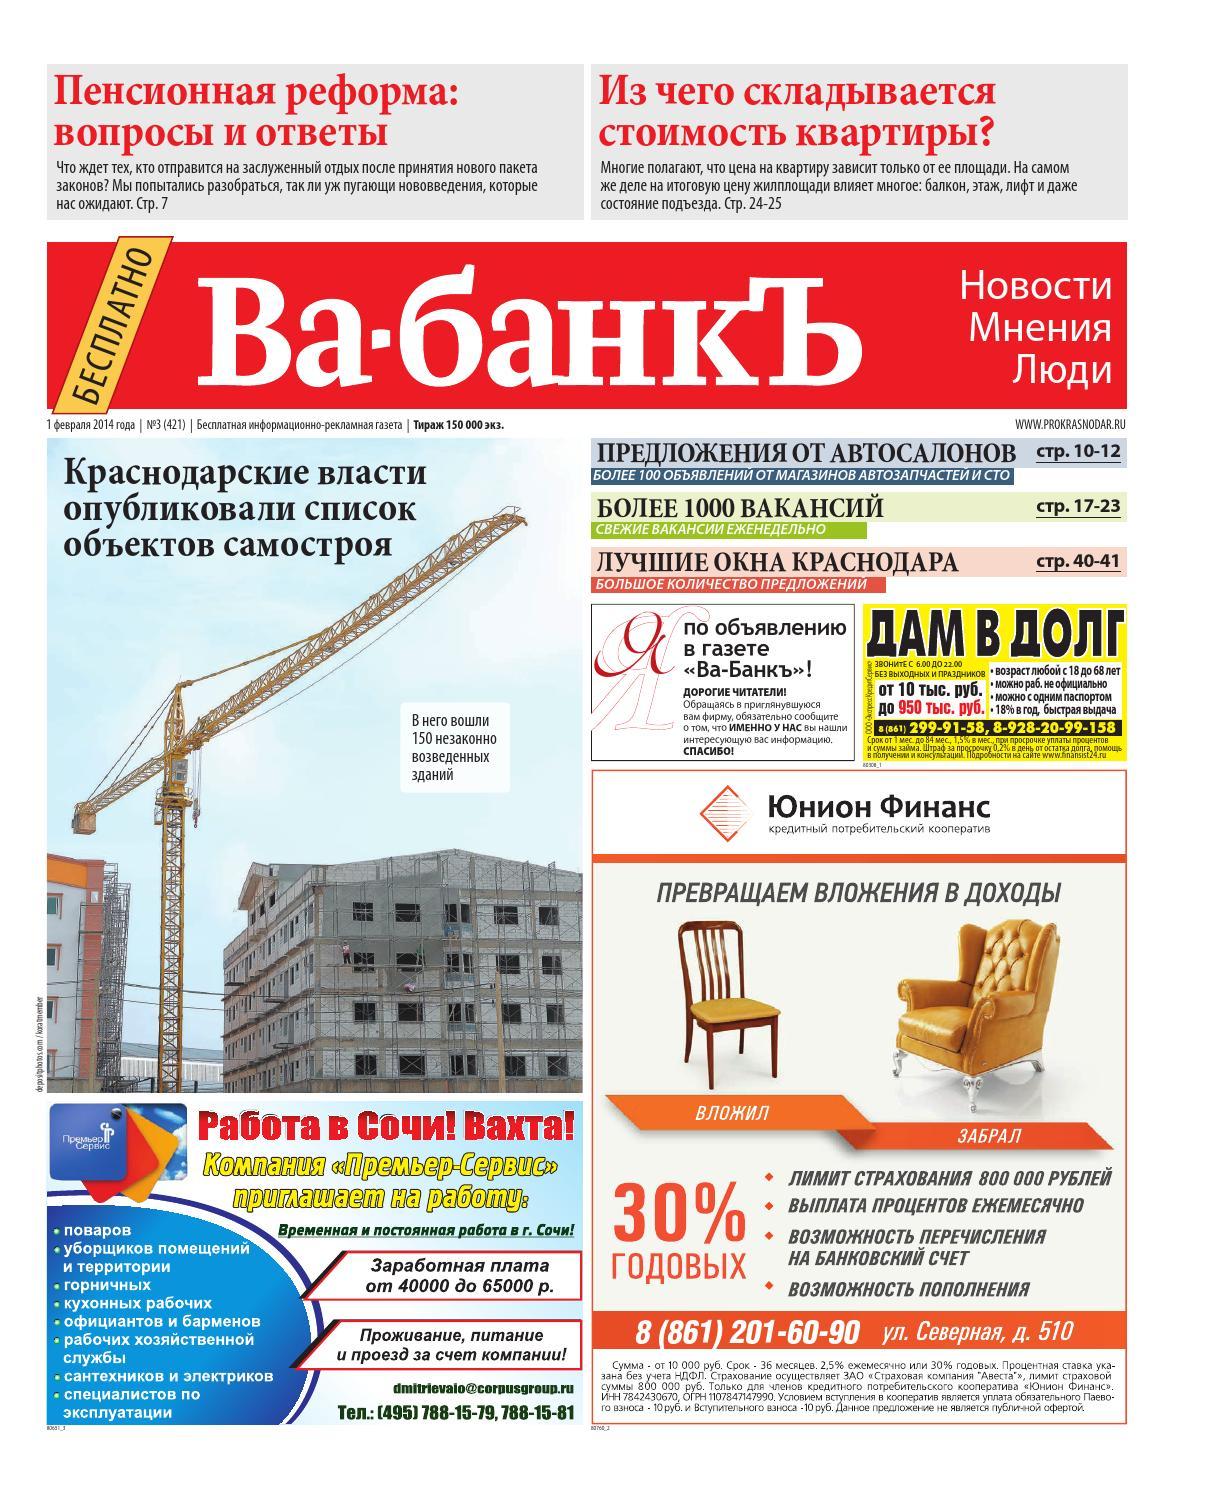 b00d42a01a917 Ва-банкъ в Краснодаре. № 3 (от 1 февраля 2014 года) by Denis Kartashov -  issuu